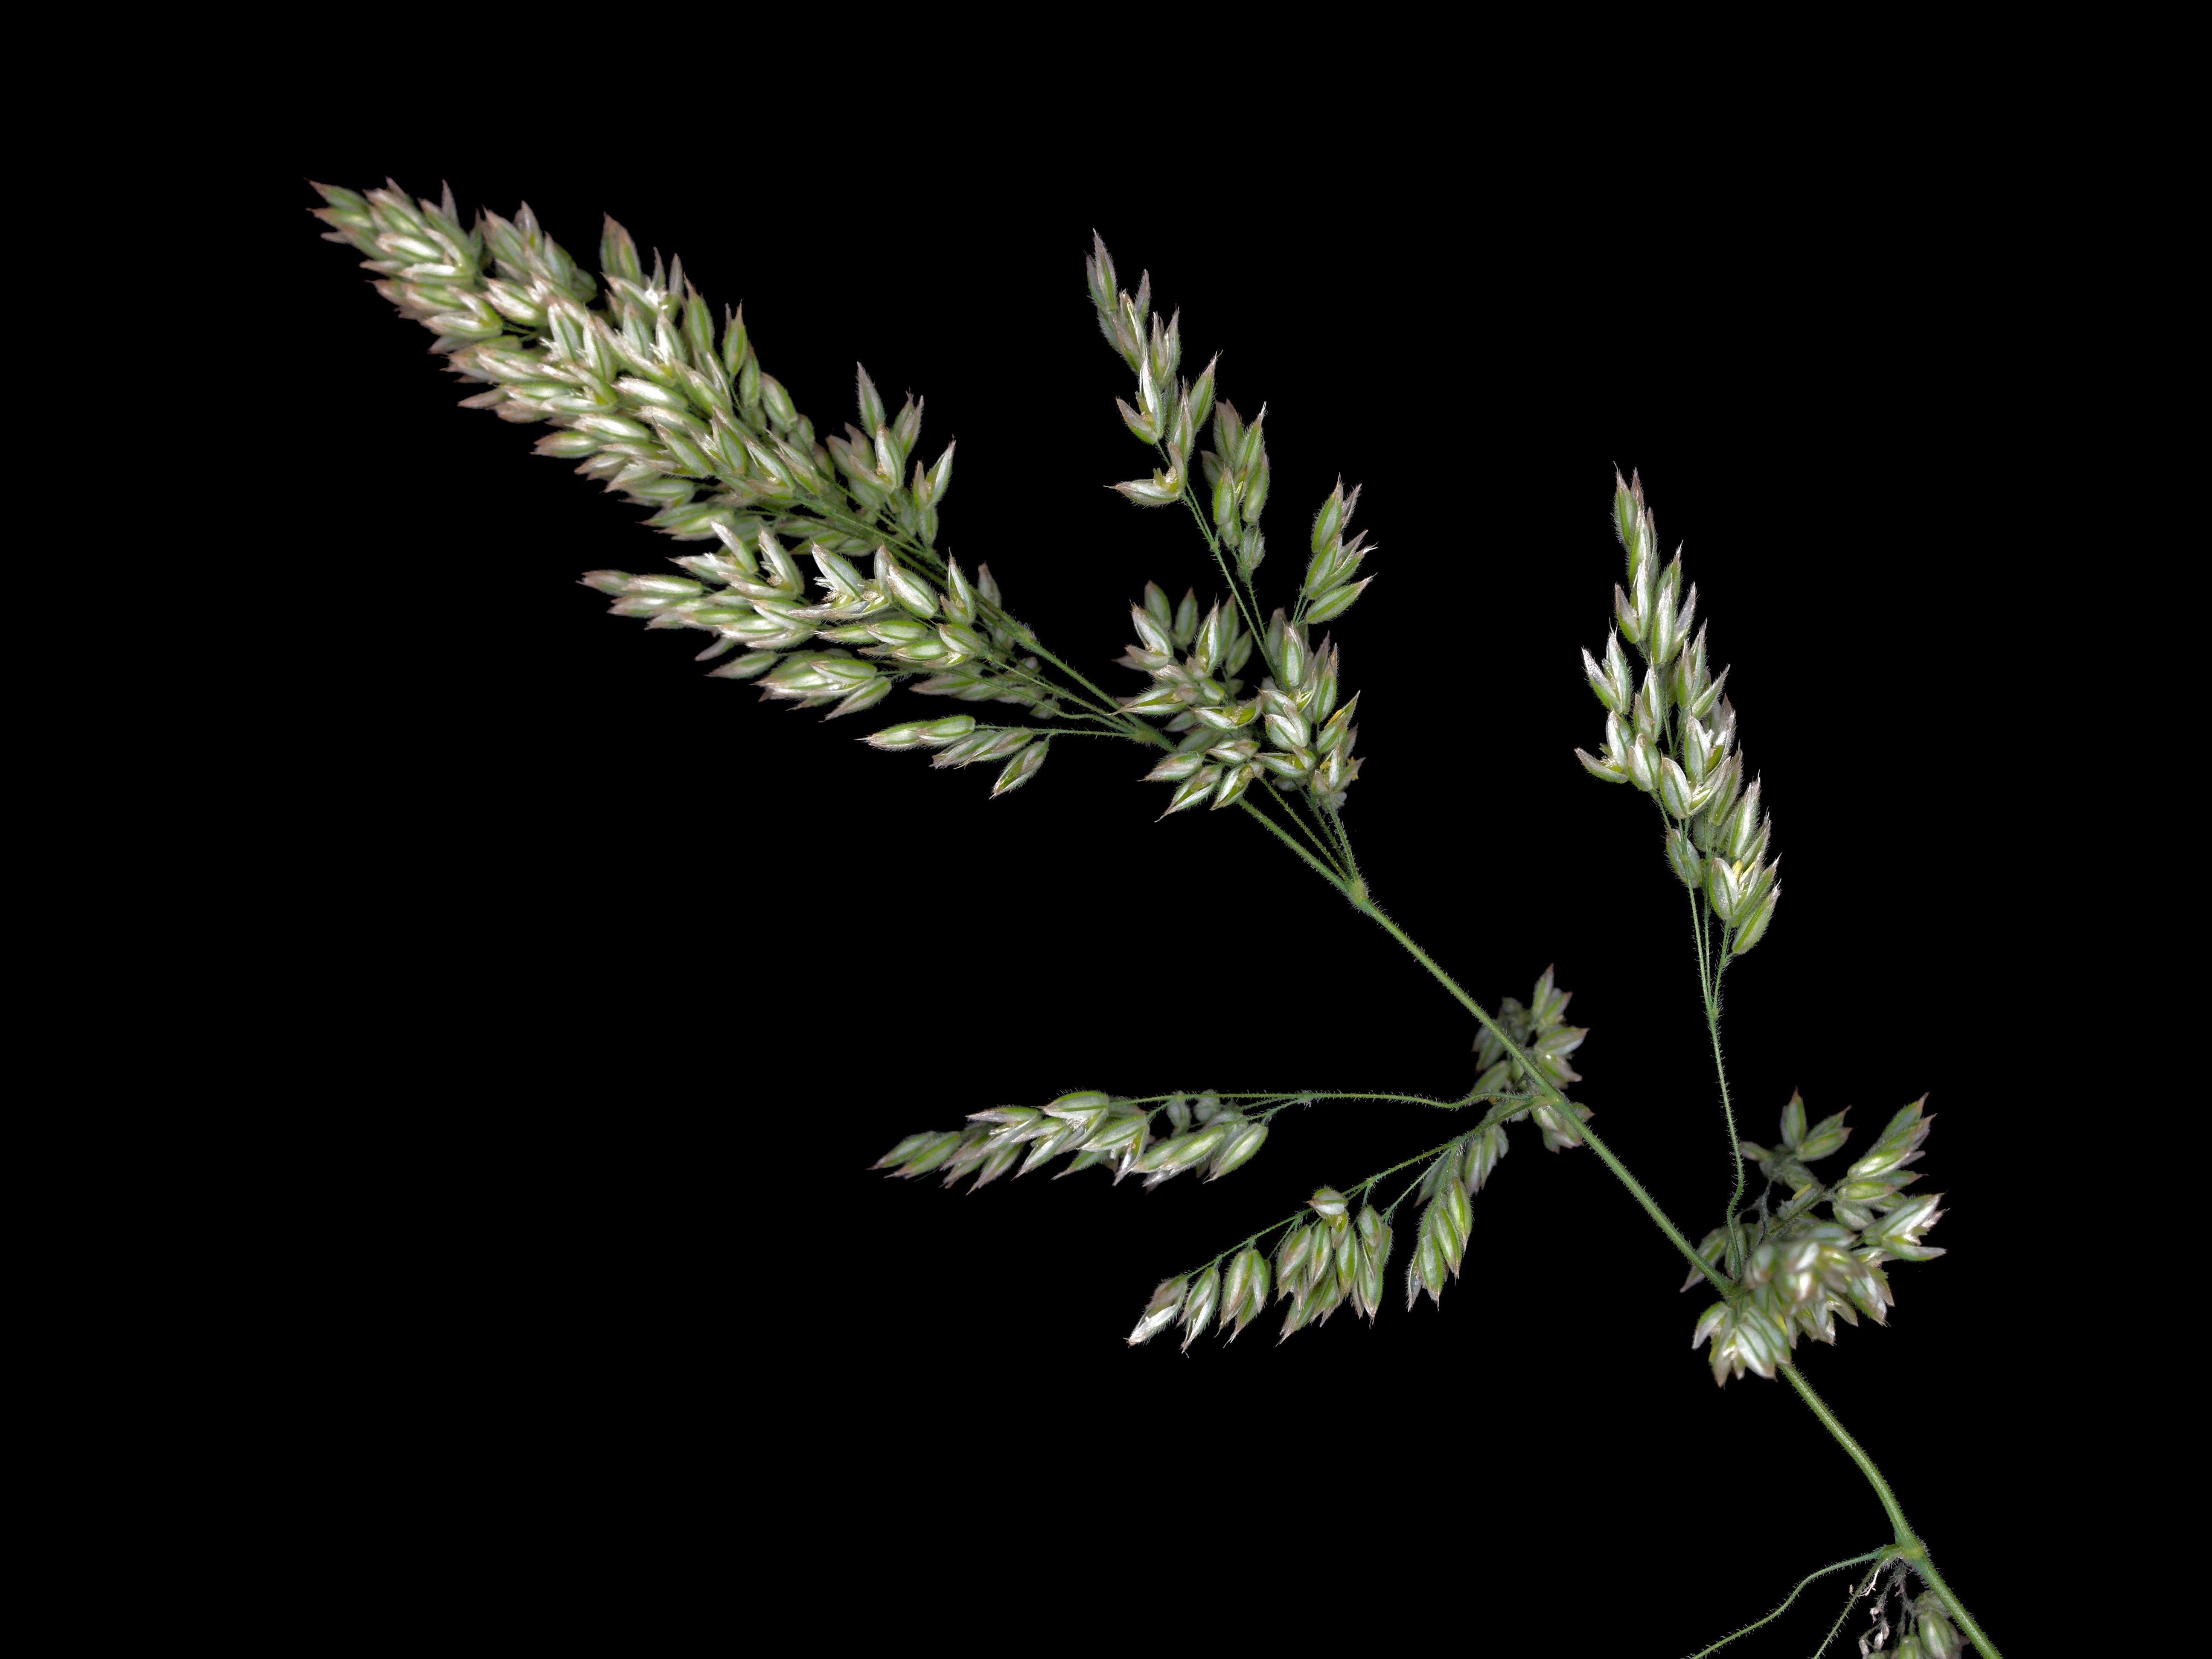 Grasses-10.jpeg